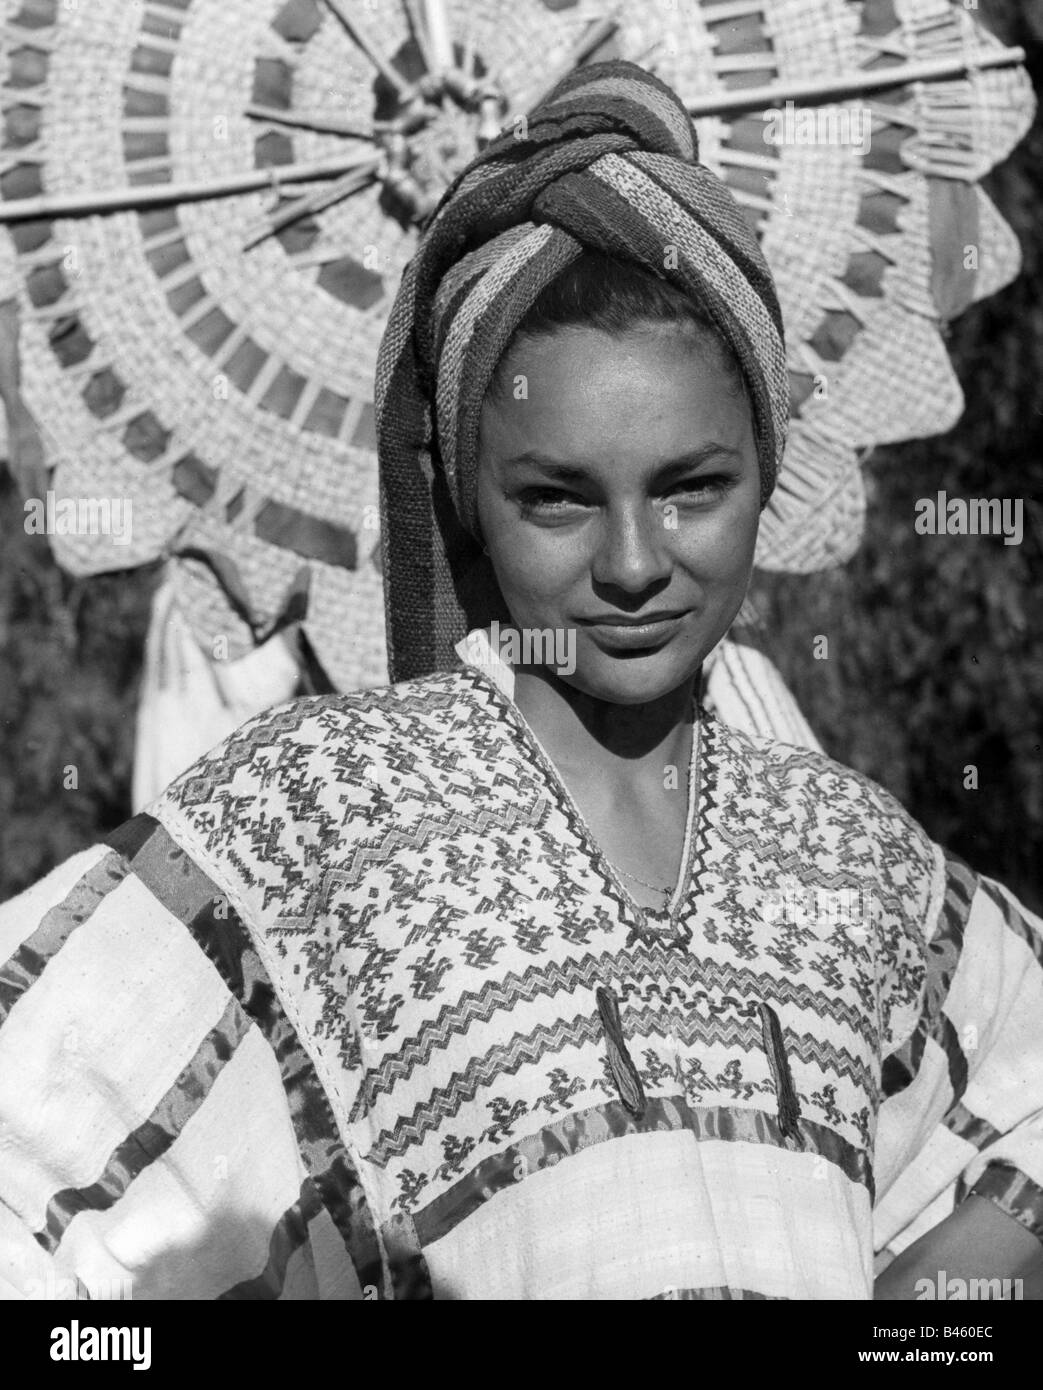 Moda Traje Modelo Con Vestido De China Poblana 1960